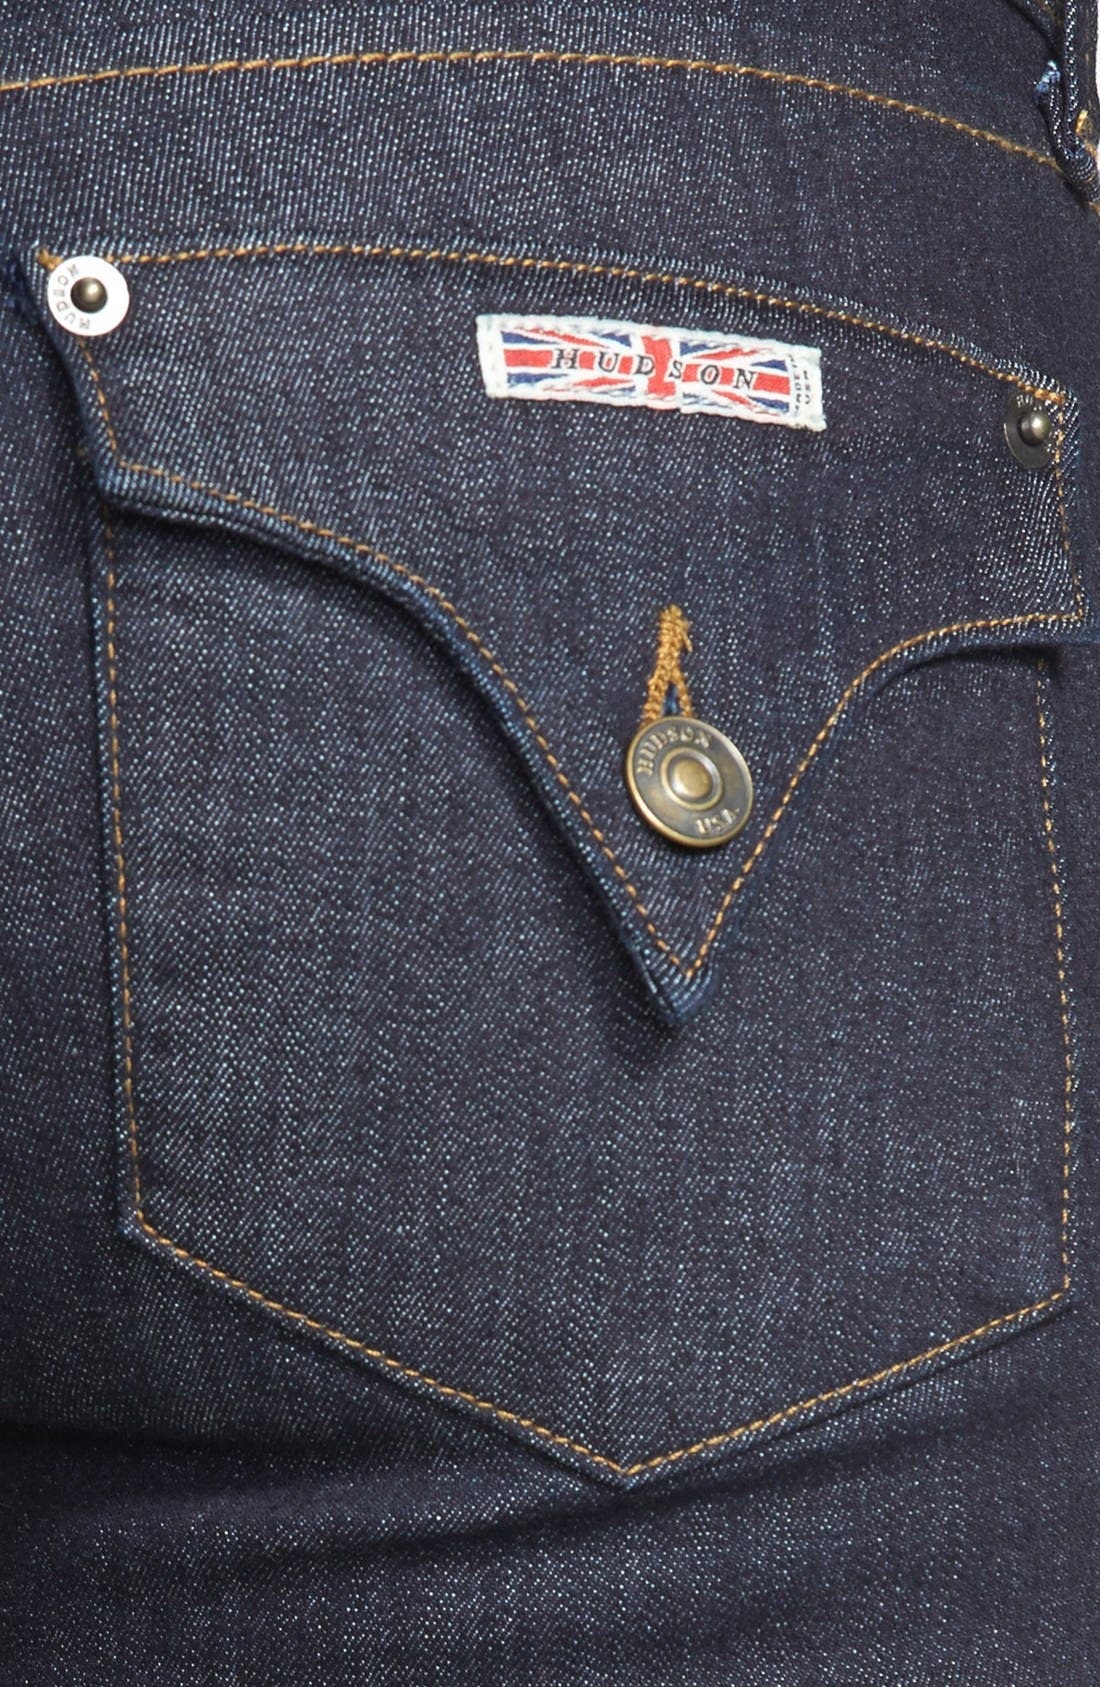 Alternate Image 3  - Hudson Jeans 'Collin' Skinny Jeans (Foley)